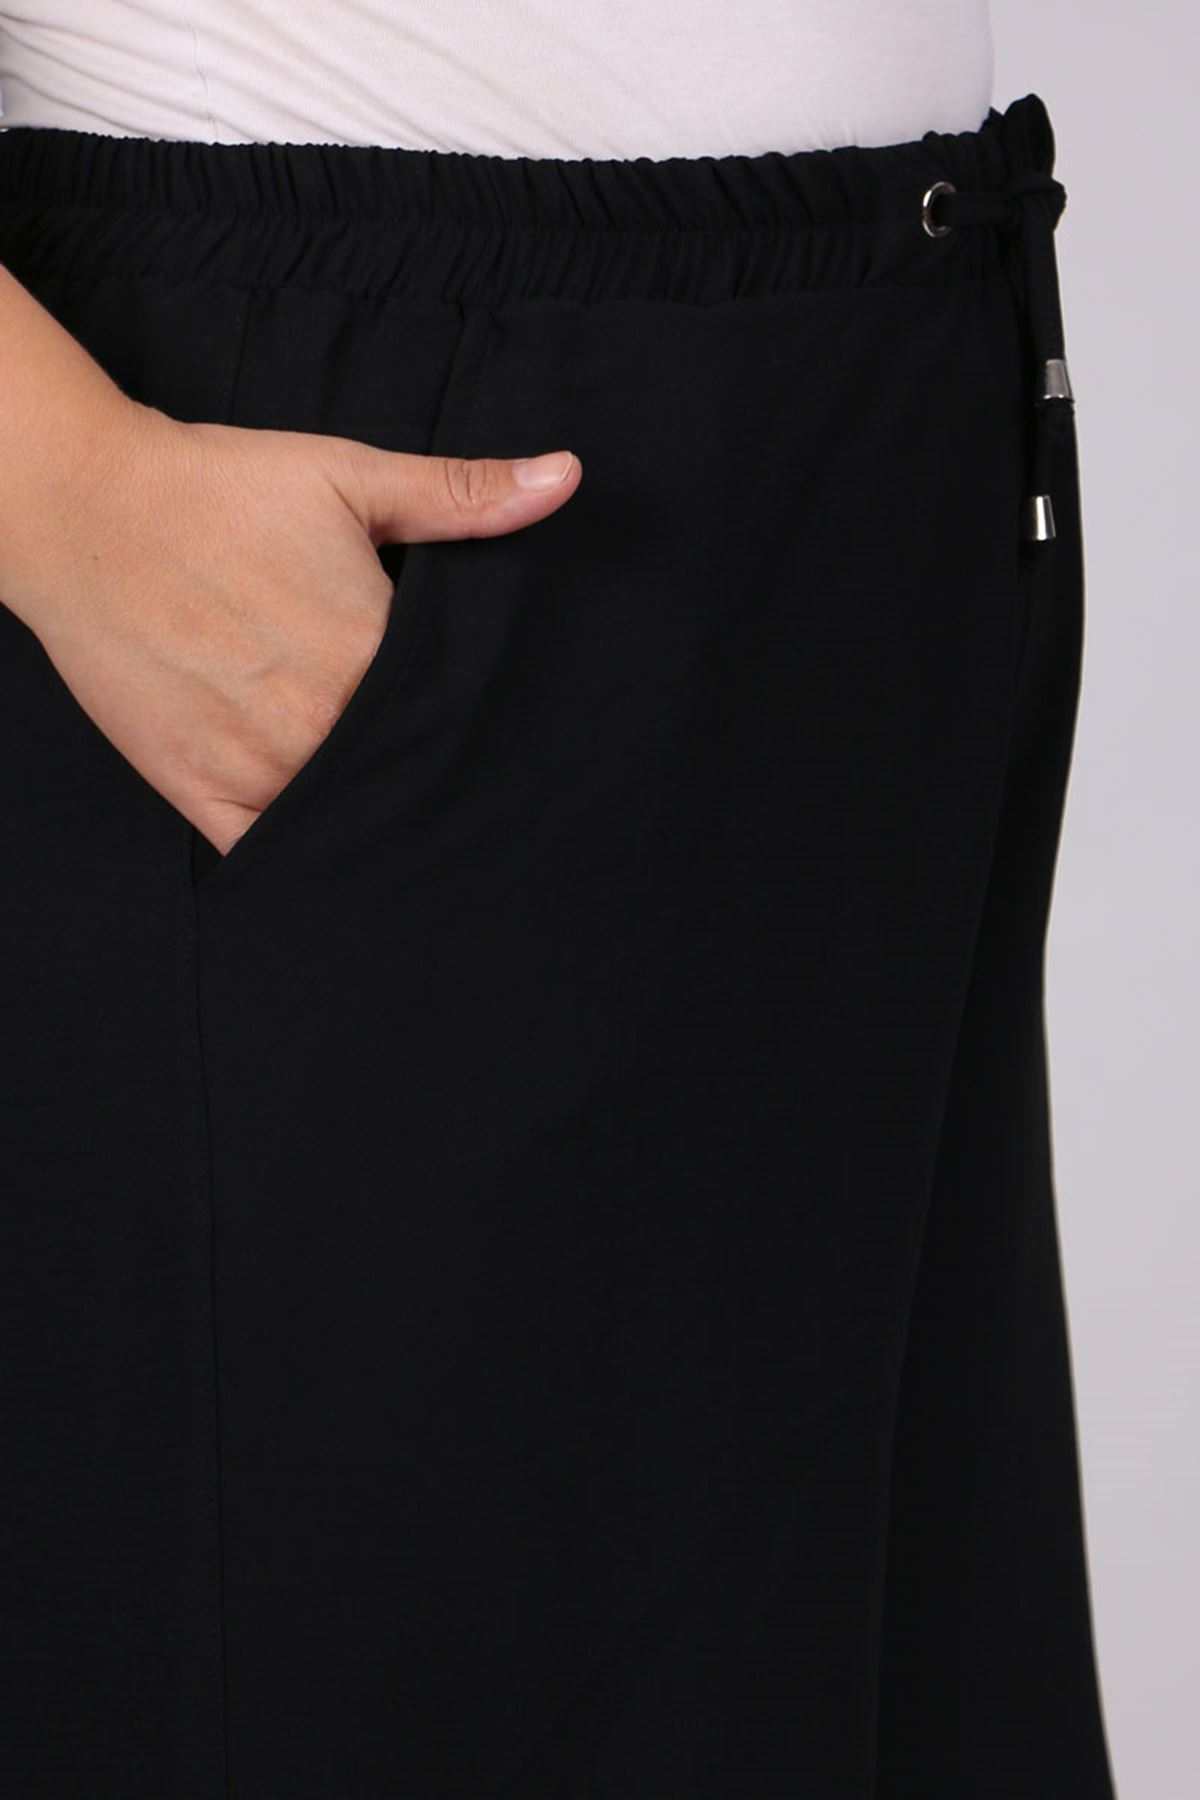 9170 Büyük Beden Bol Paça Moskino Pantolon - Siyah